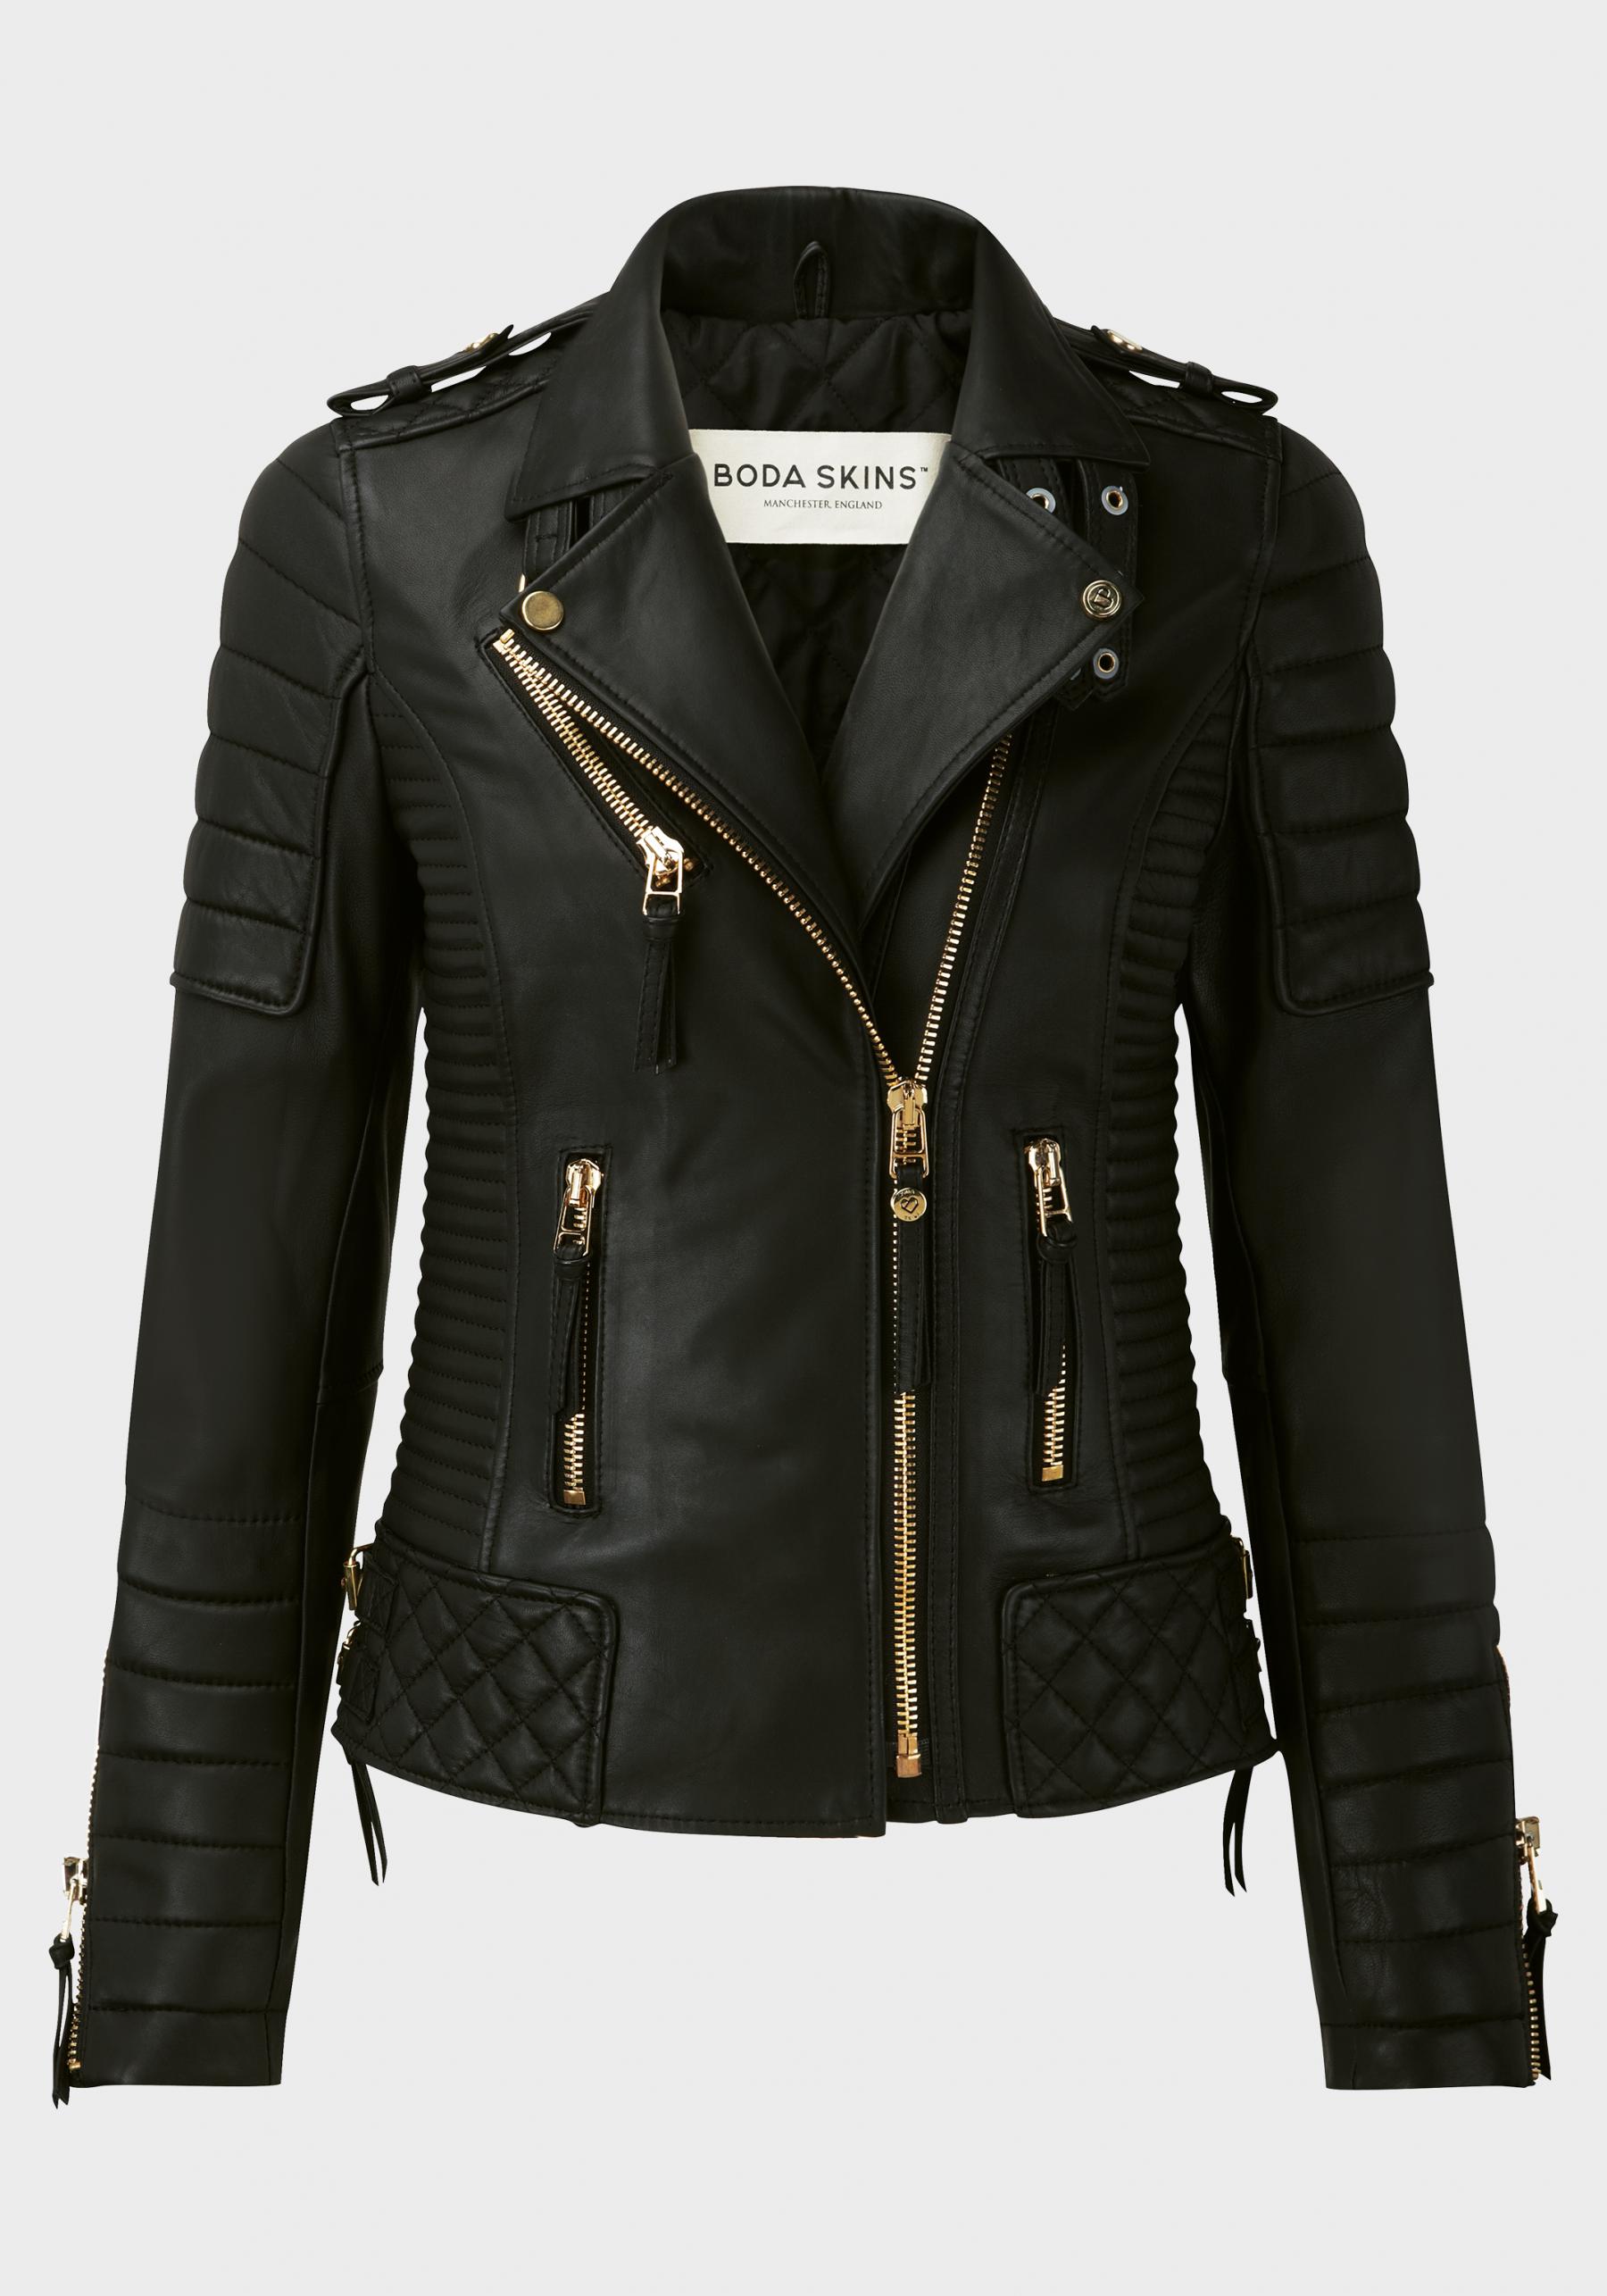 Kay Michaels Quilted Biker V.2 (Gold Hardware) - Jackets - Women ...